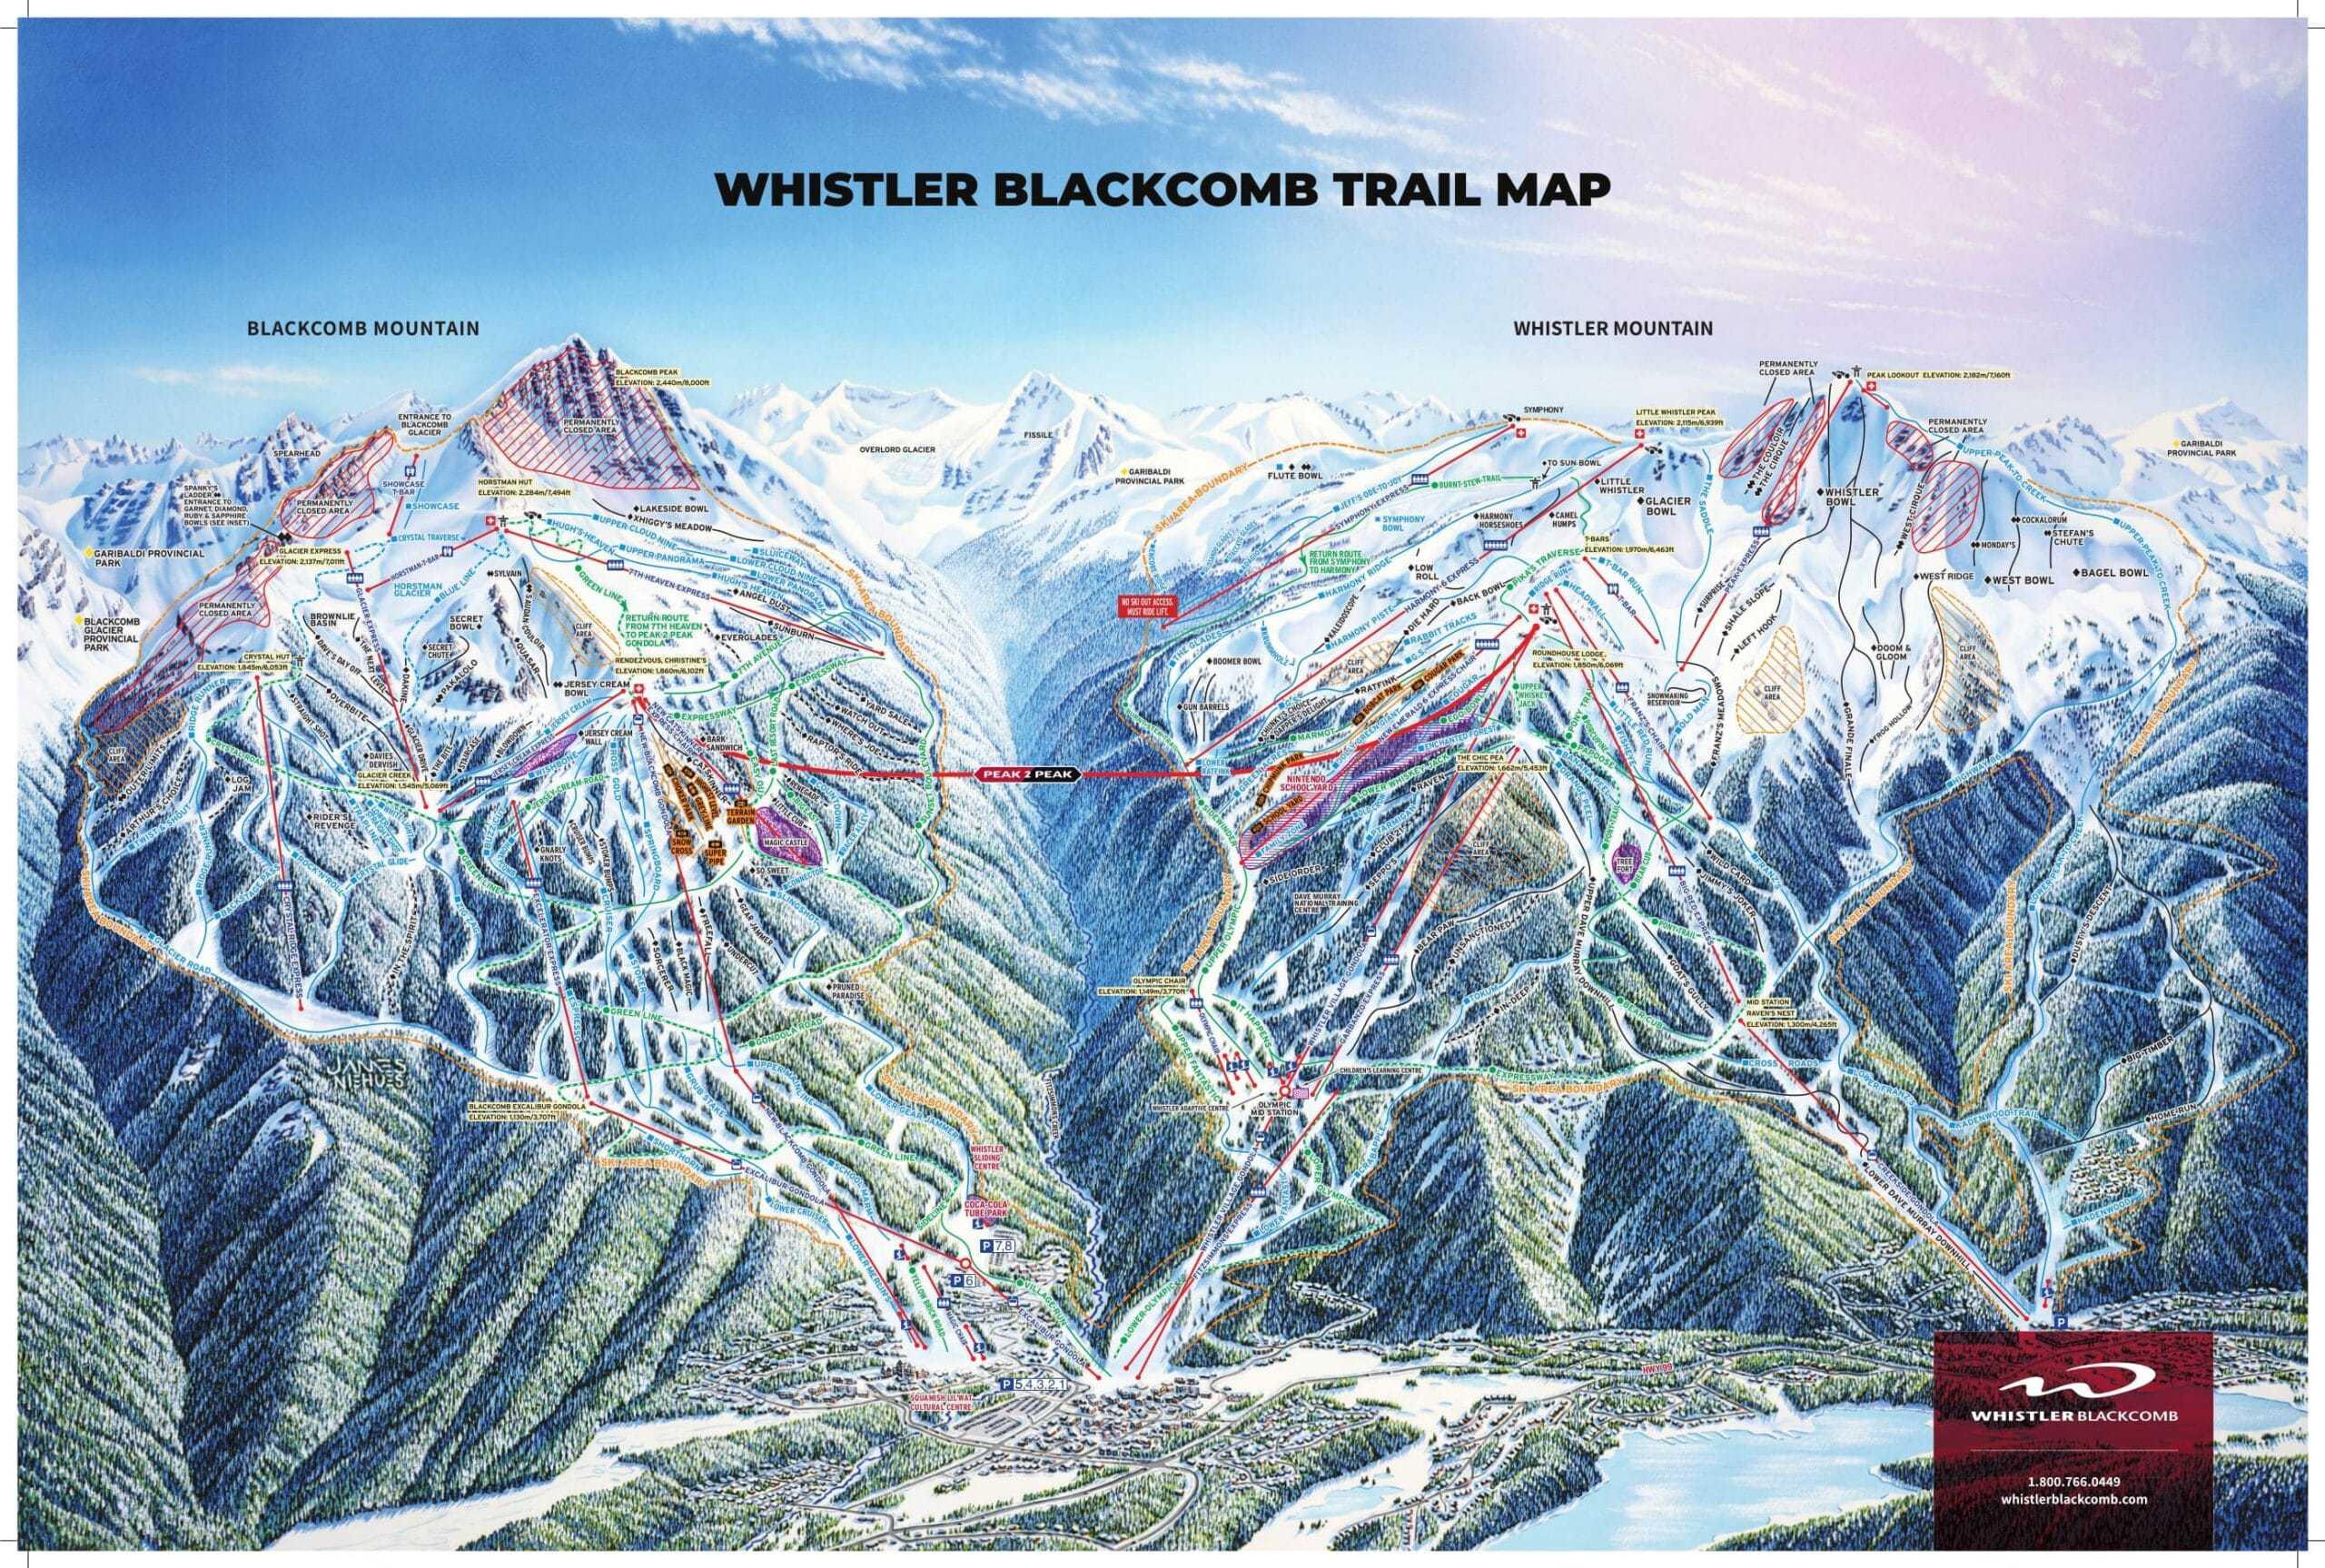 Whistler Blackcomb Ski Trail Map 2019 scaled